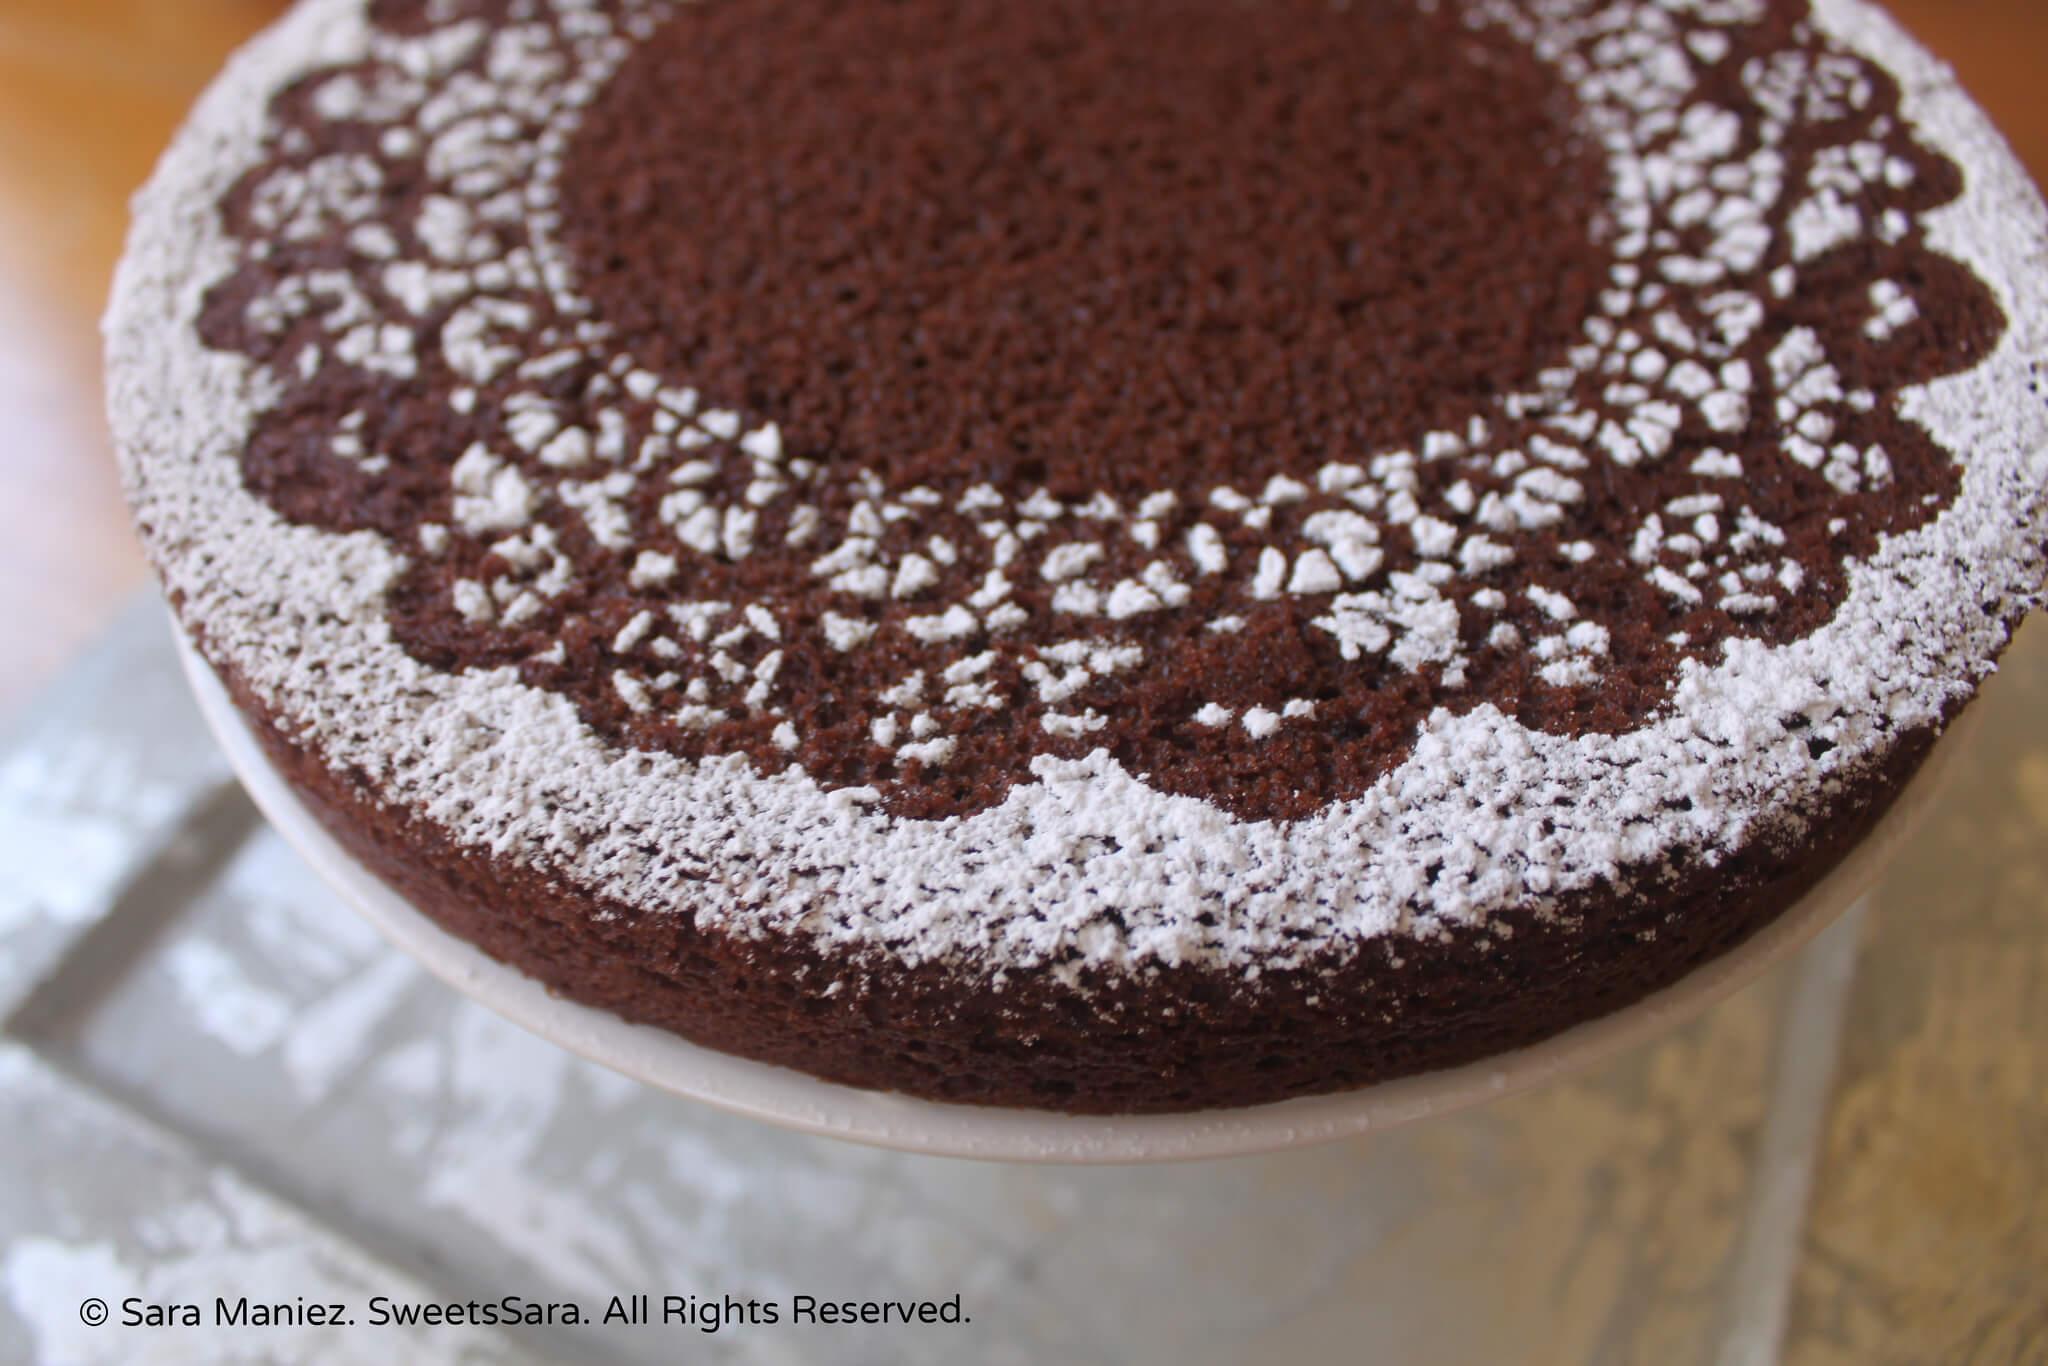 ... sugar tops this subtly orange-almond flavored chocolate cake